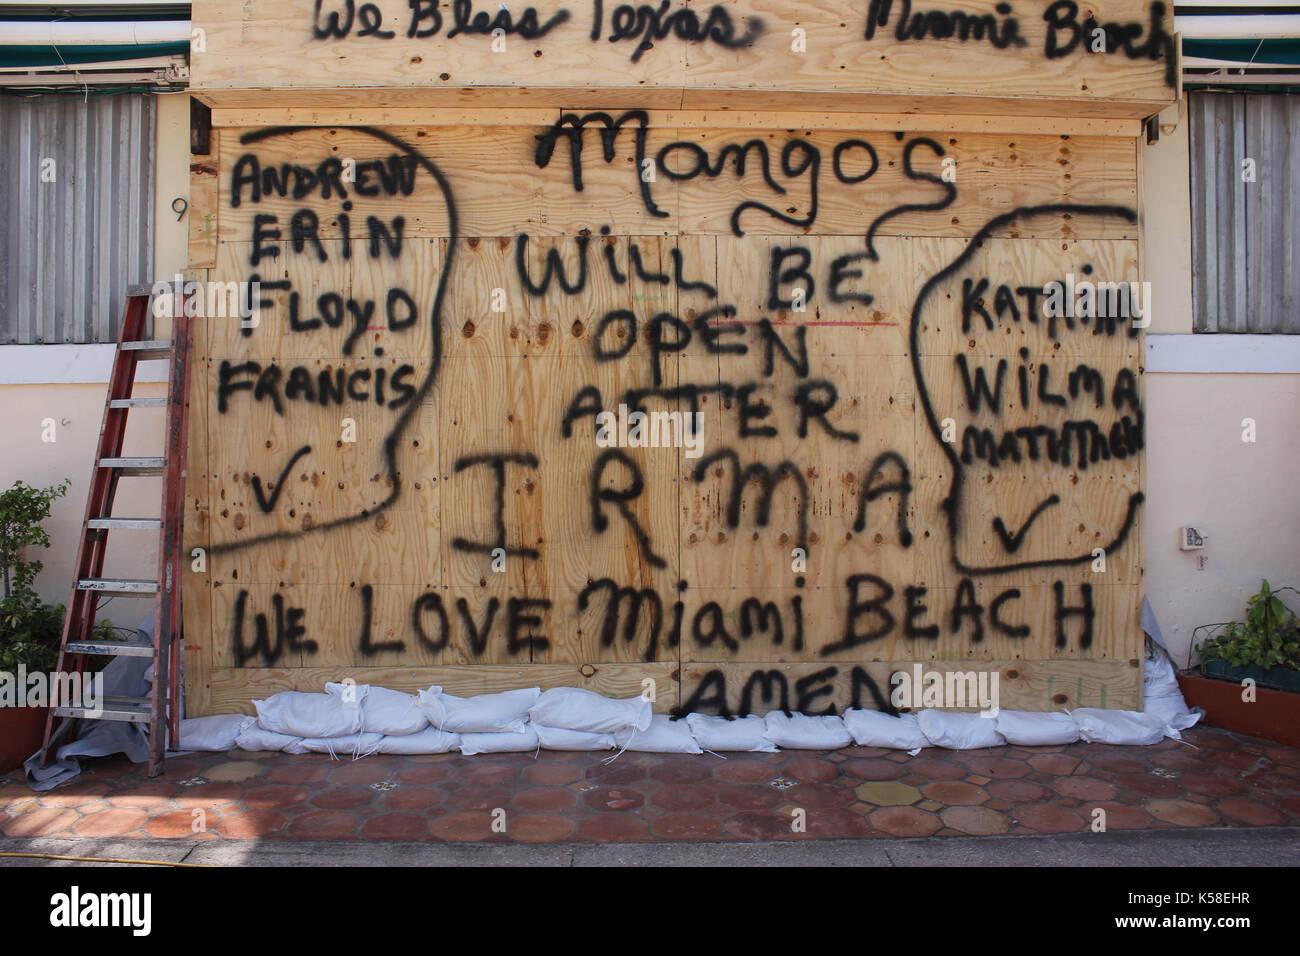 Miami Beach, Deserted, Pre Hurricane Irma, September 8, 2017 Stock Photo